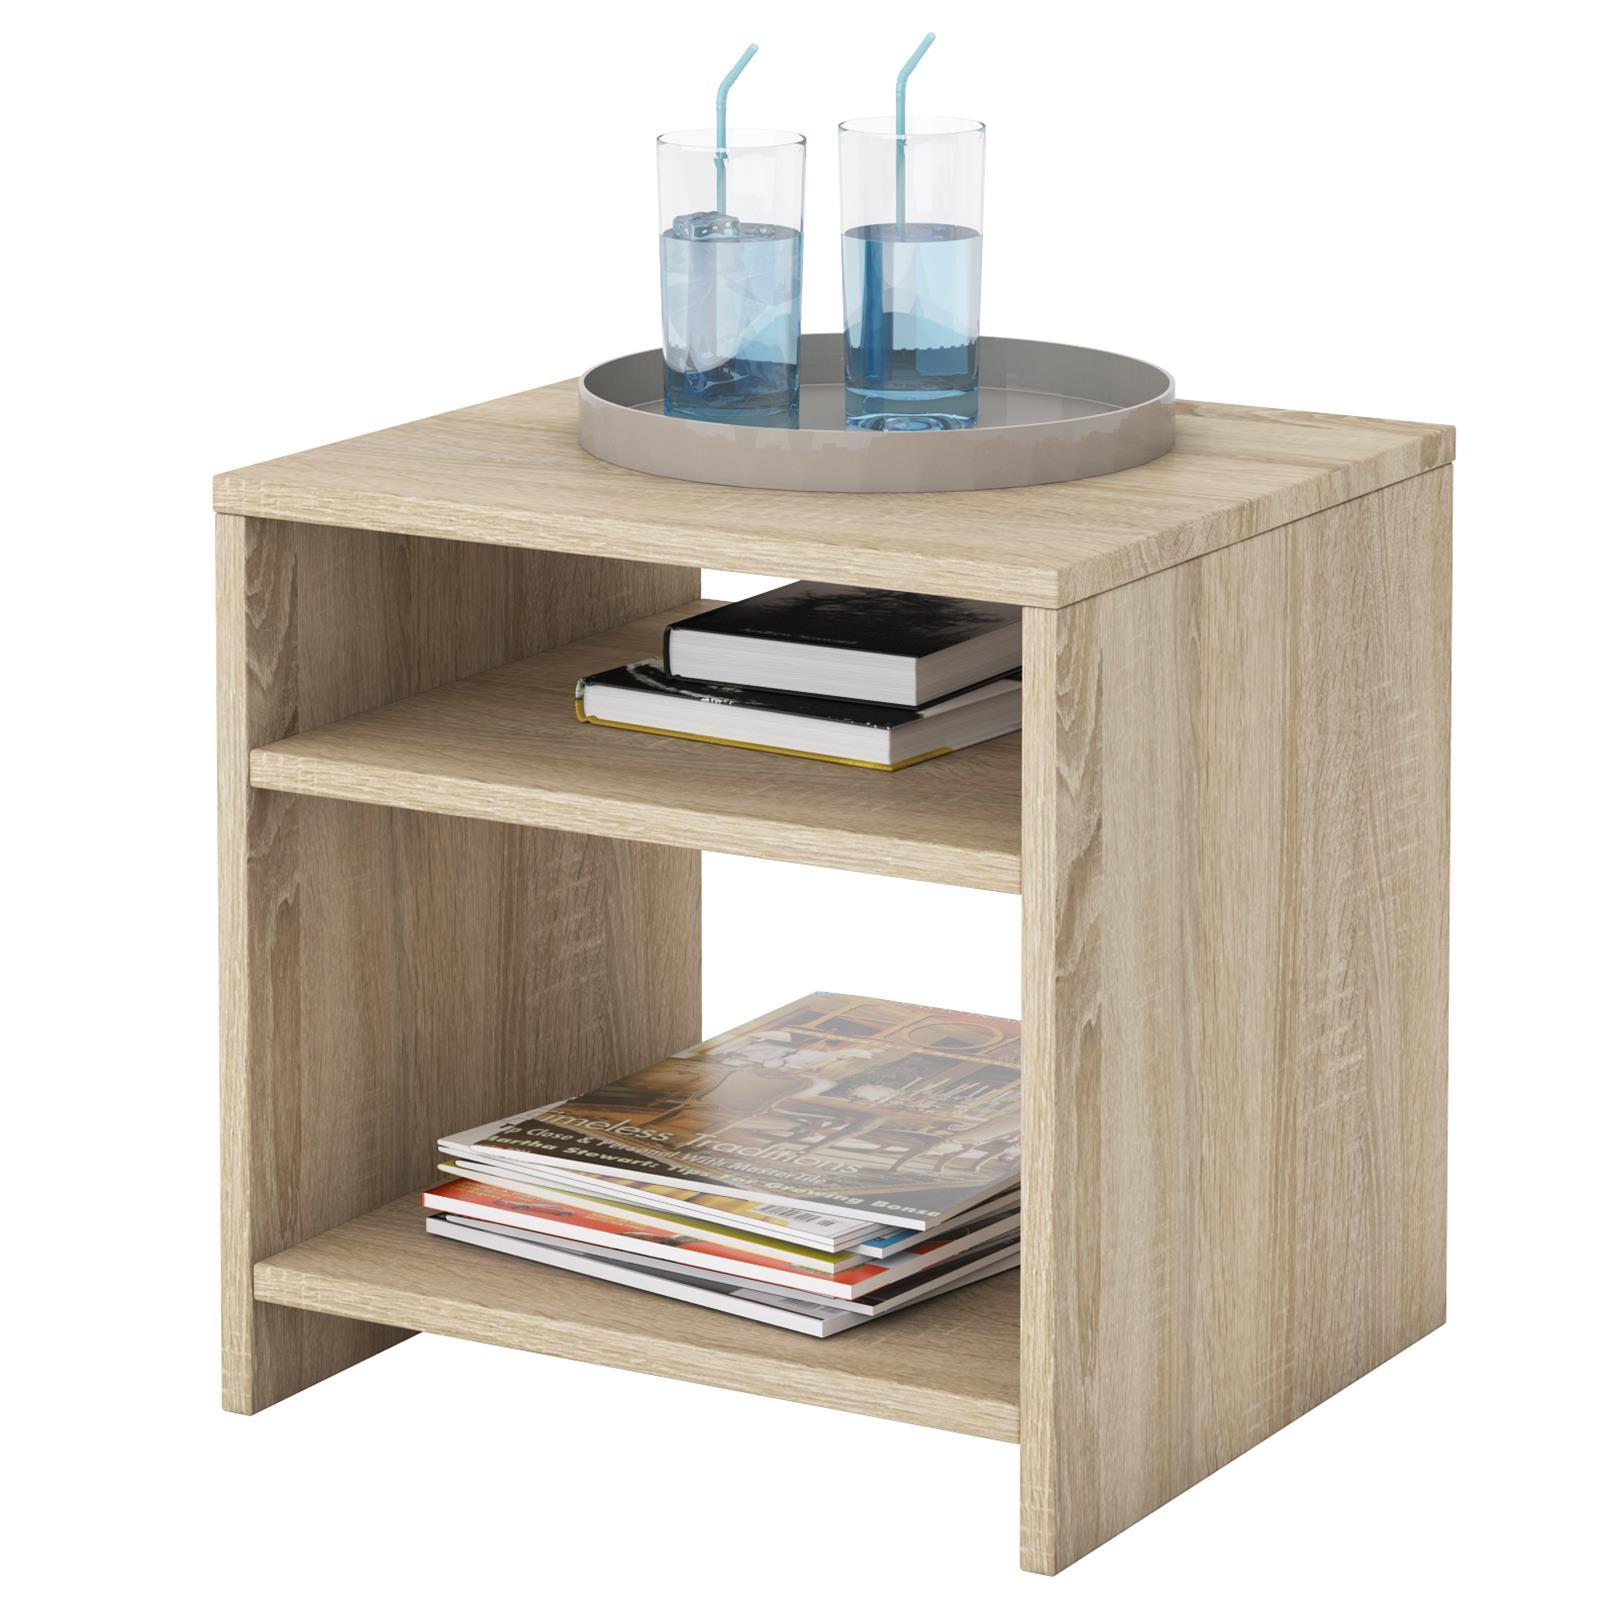 table d 39 appoint livorno m lamin ch ne sonoma mobil meubles. Black Bedroom Furniture Sets. Home Design Ideas